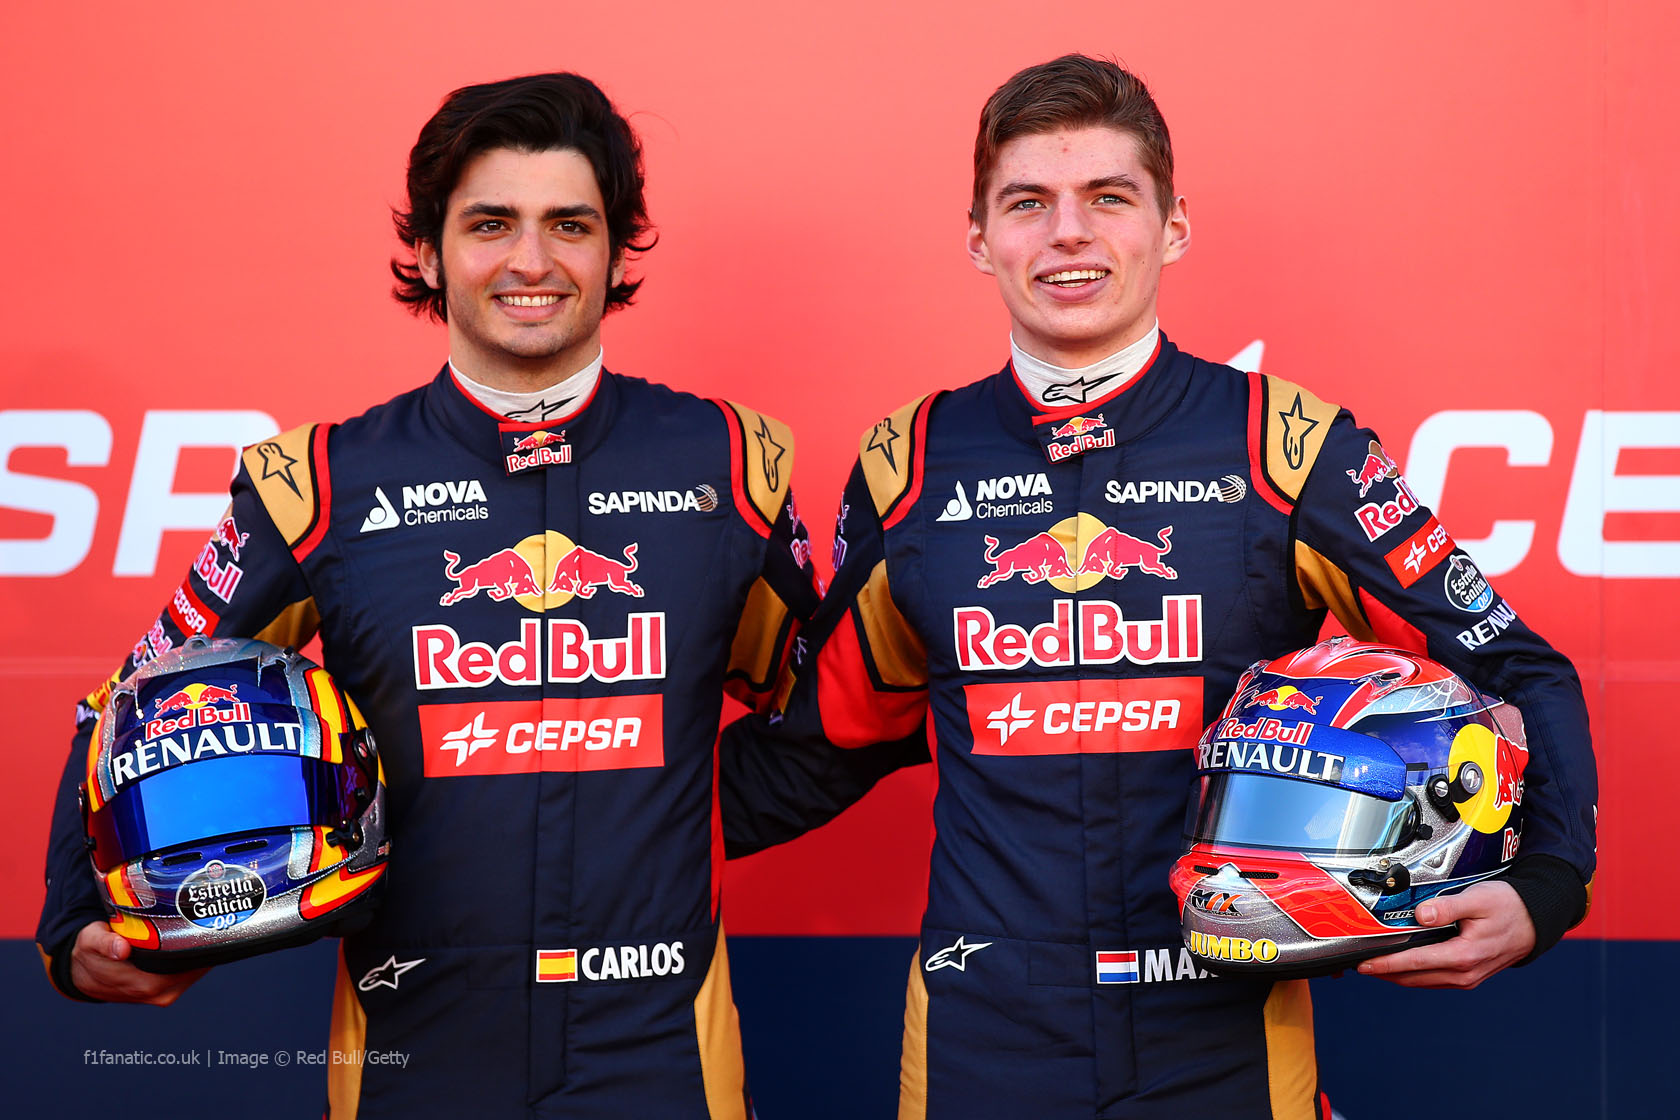 Carlos Sainz Jnr, Max Verstappen, Toro Rosso, Jerez, 2015